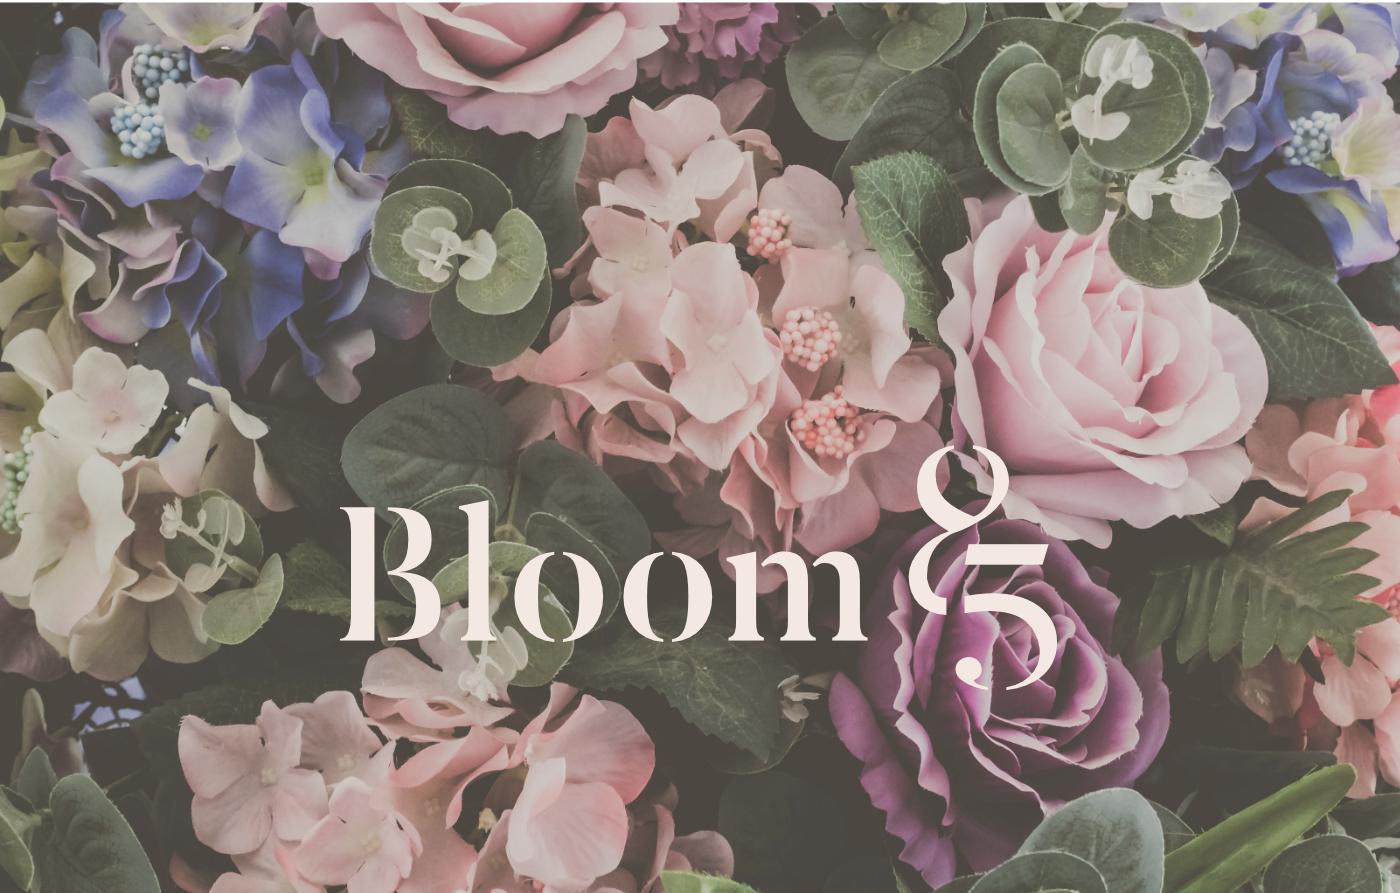 Povestea celor 85 de ingrediente Bloom85